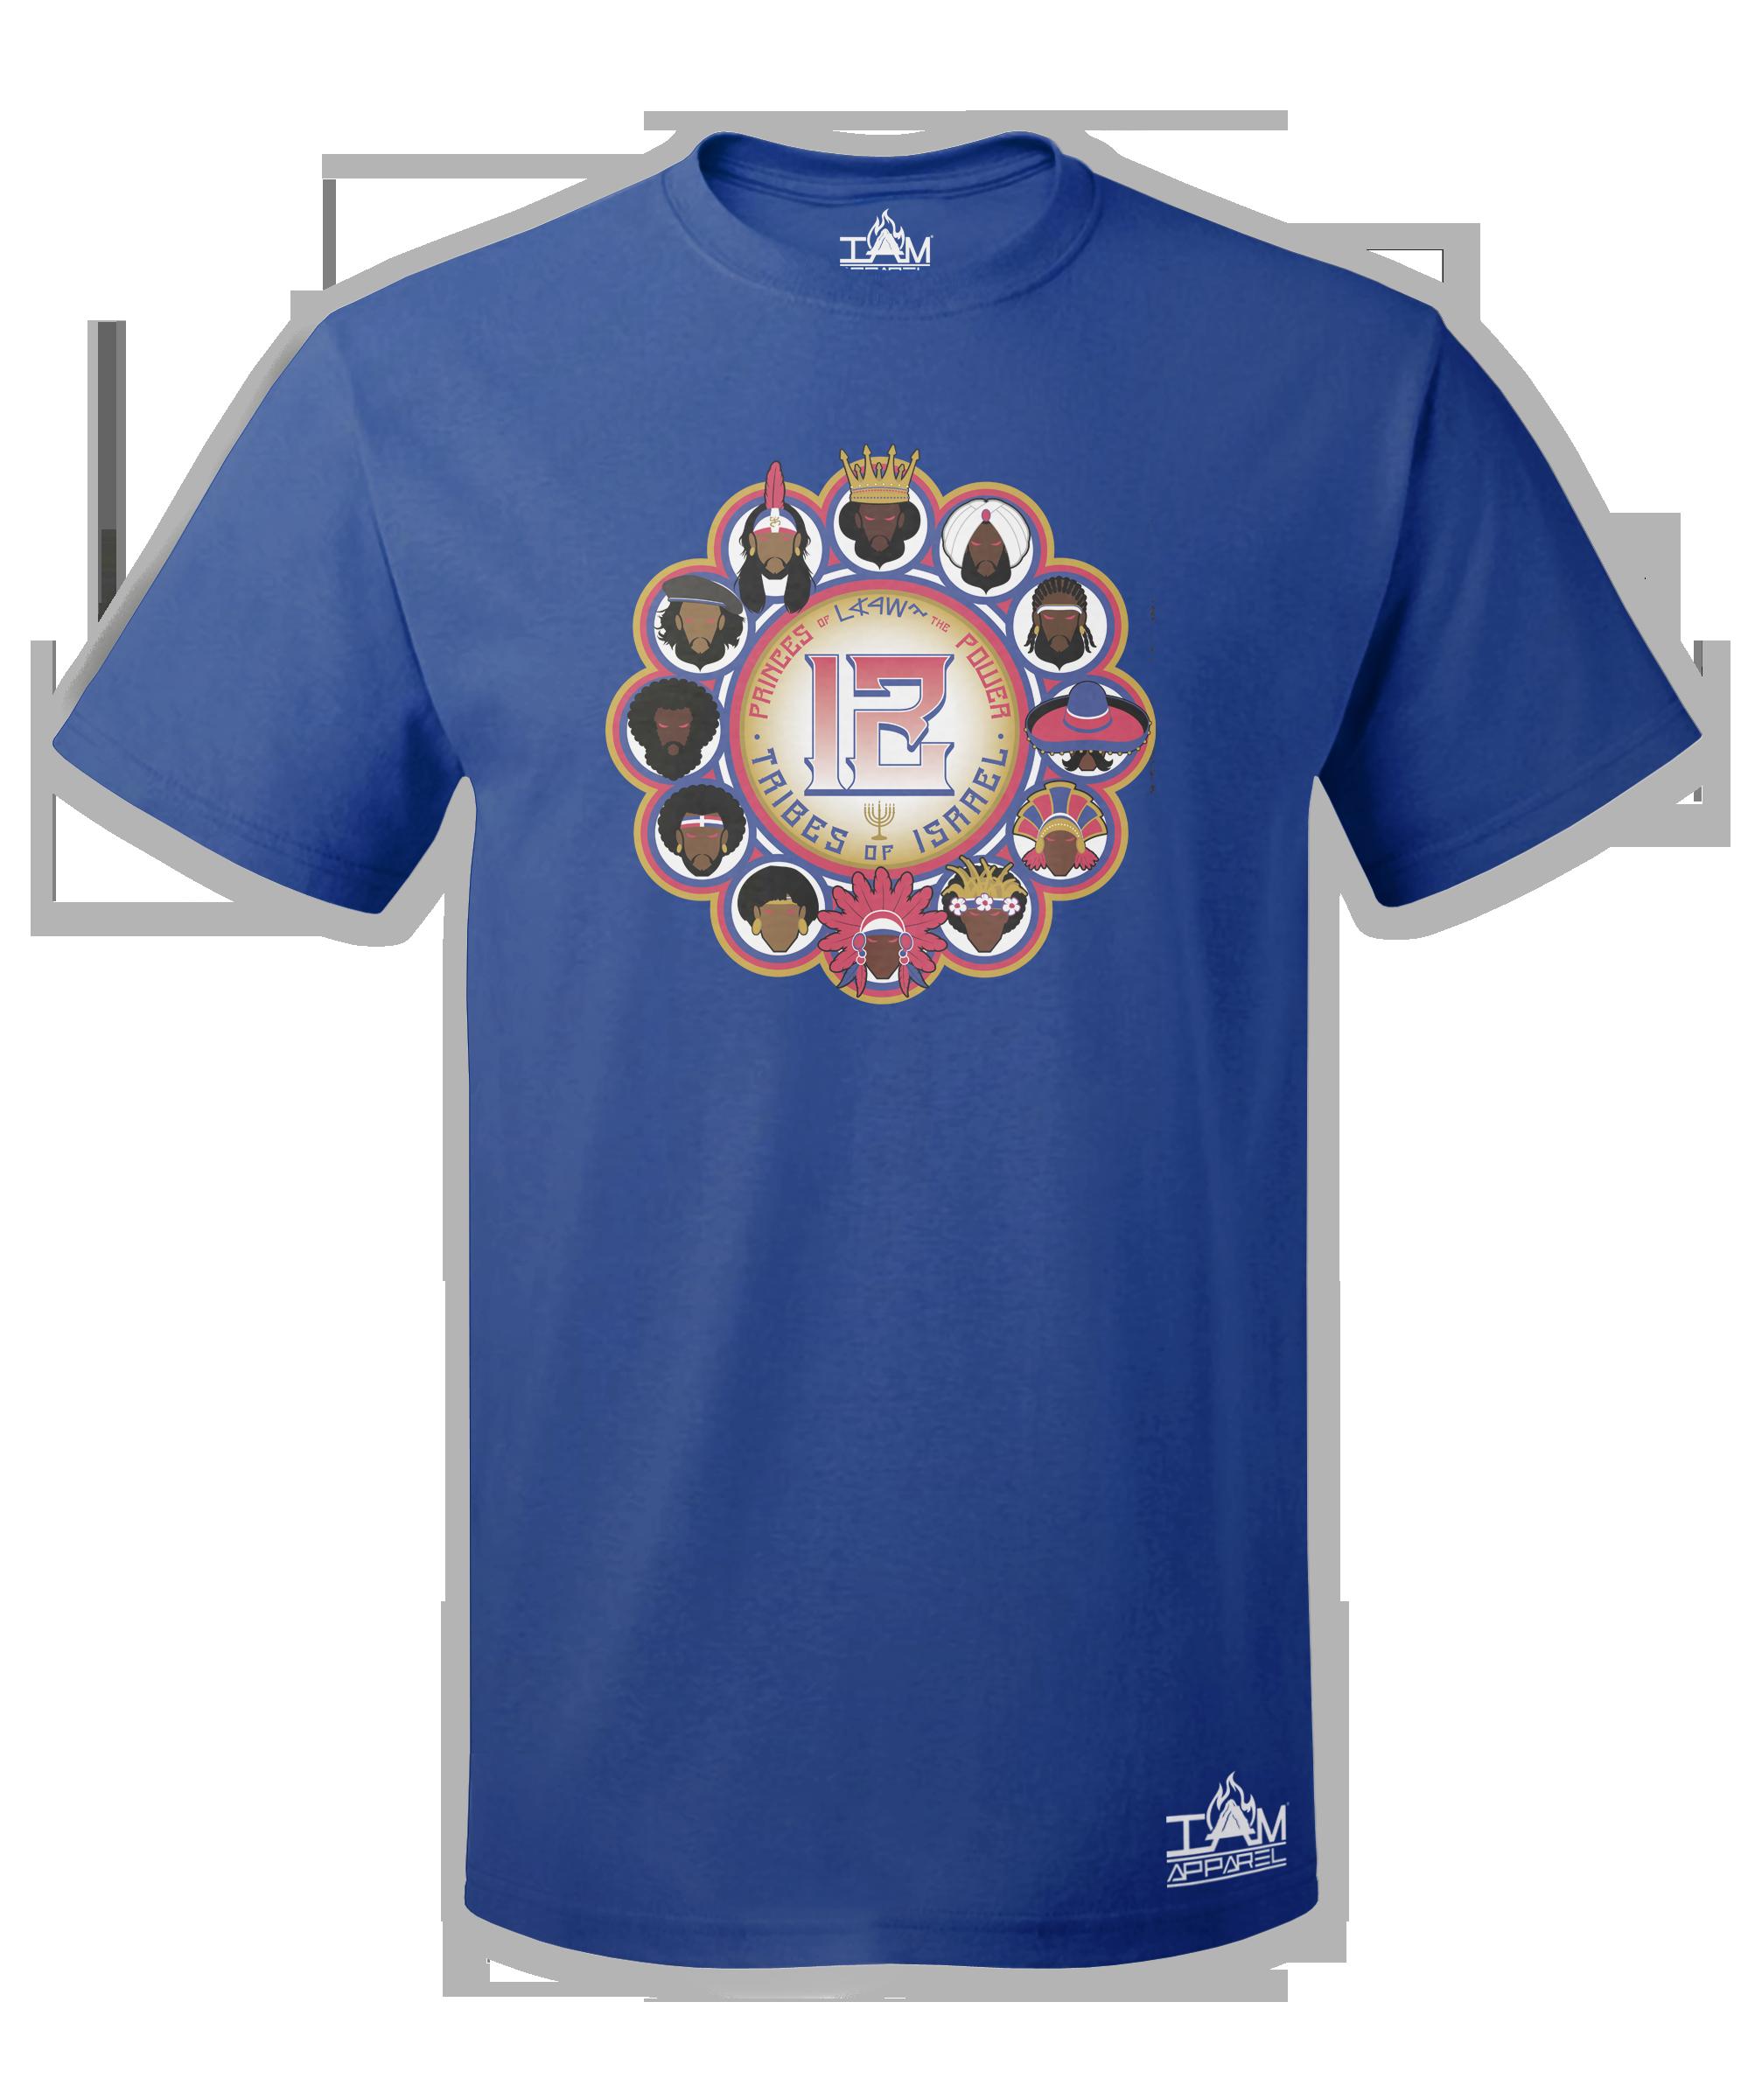 12 Tribes Image Men's  Short Sleeved T-shirt 00075